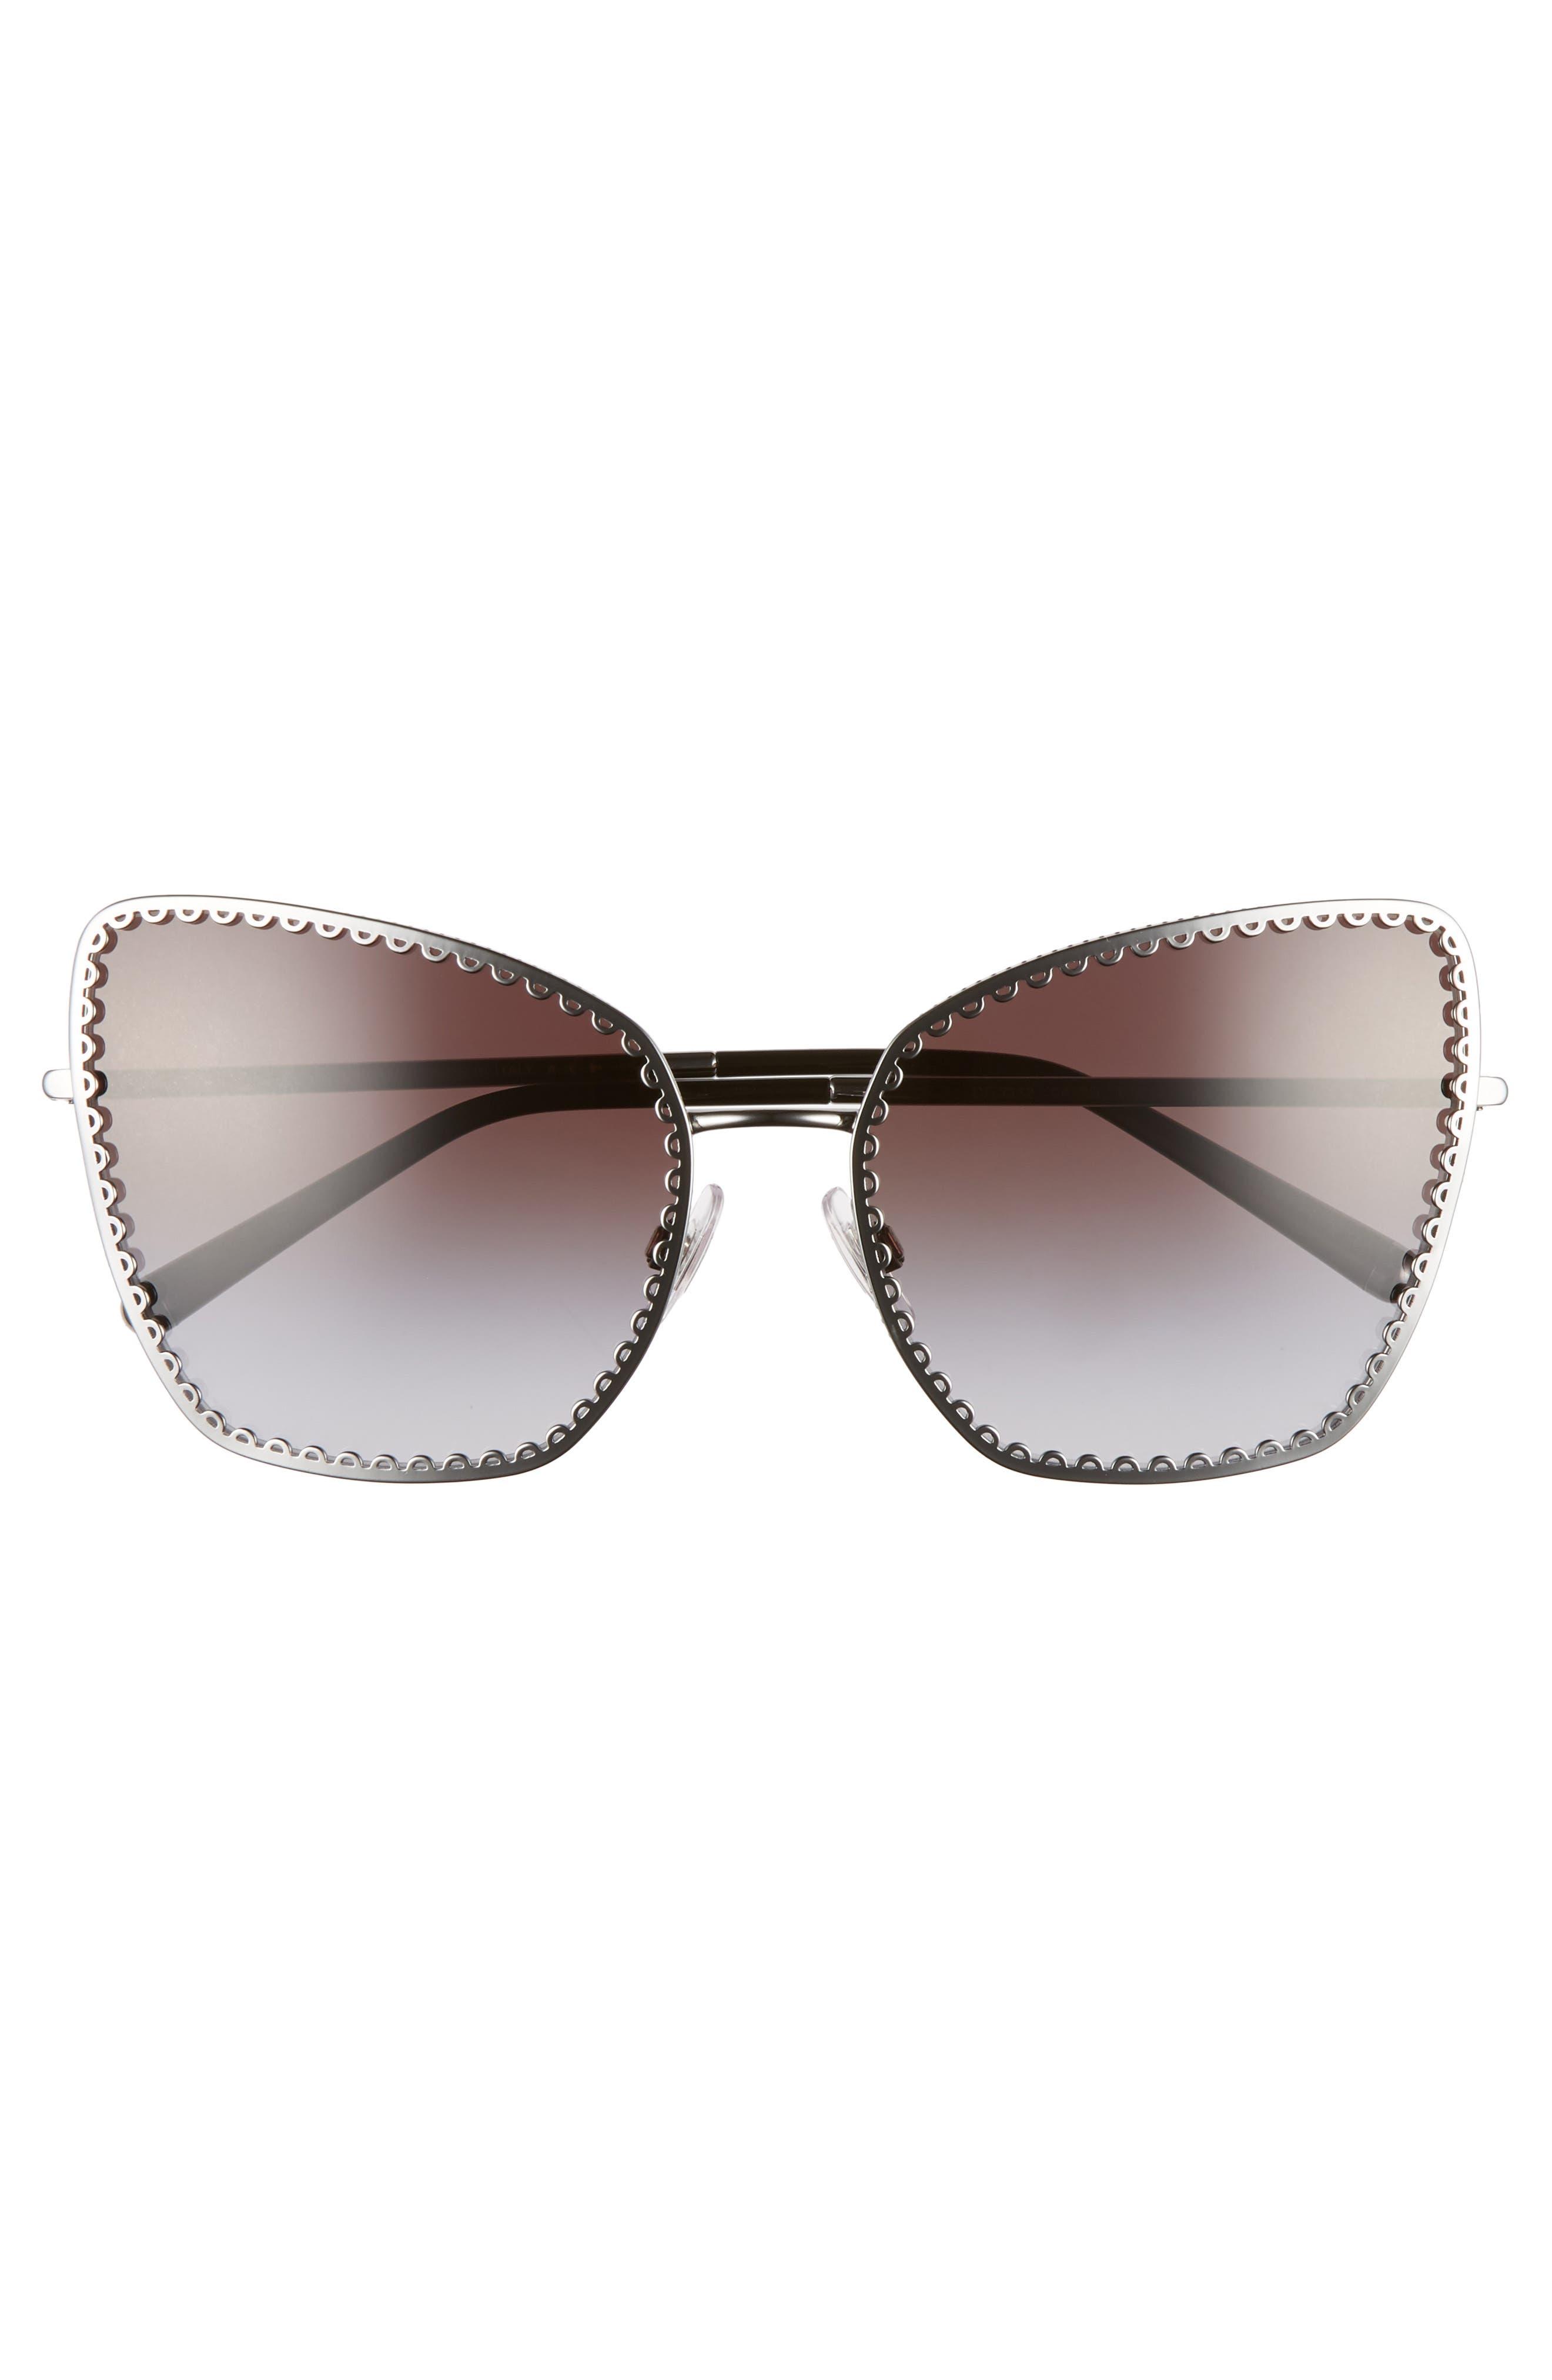 Sacred Heart 61mm Gradient Cat Eye Sunglasses,                             Alternate thumbnail 3, color,                             GUNMETAL GRADIENT